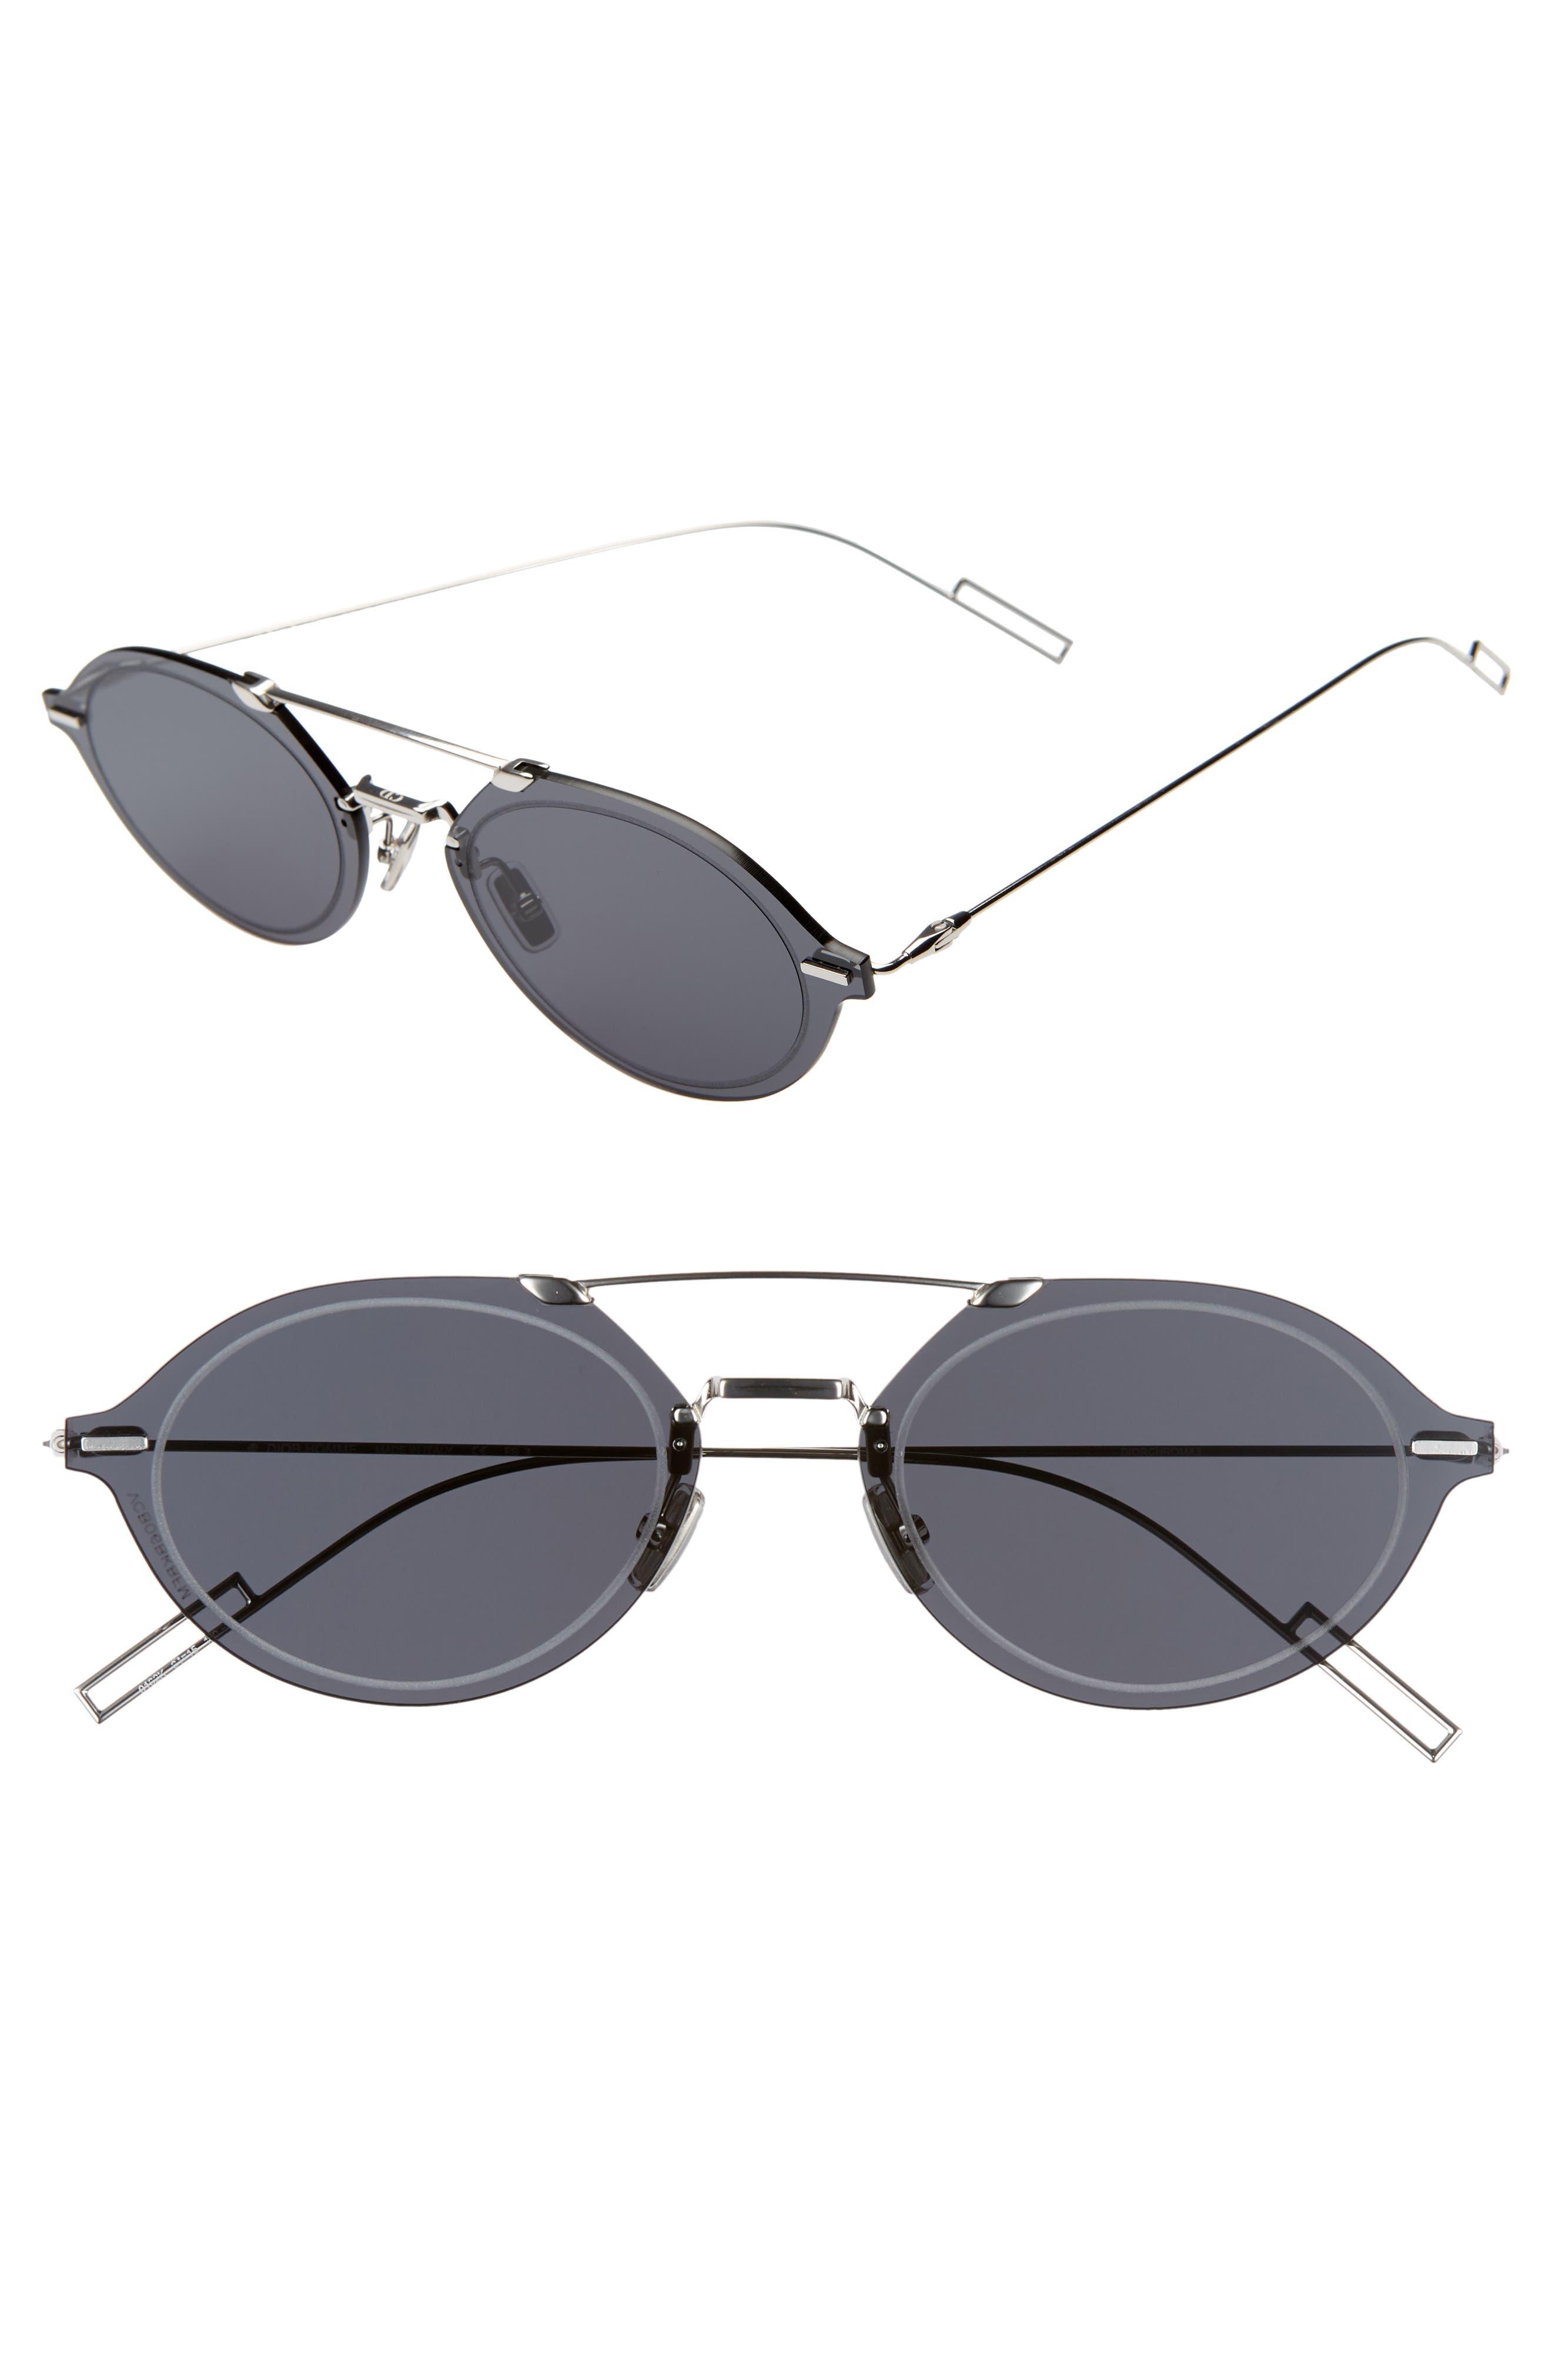 3ee0626d4621 Men s Dior Homme Sunglasses   Eyeglasses